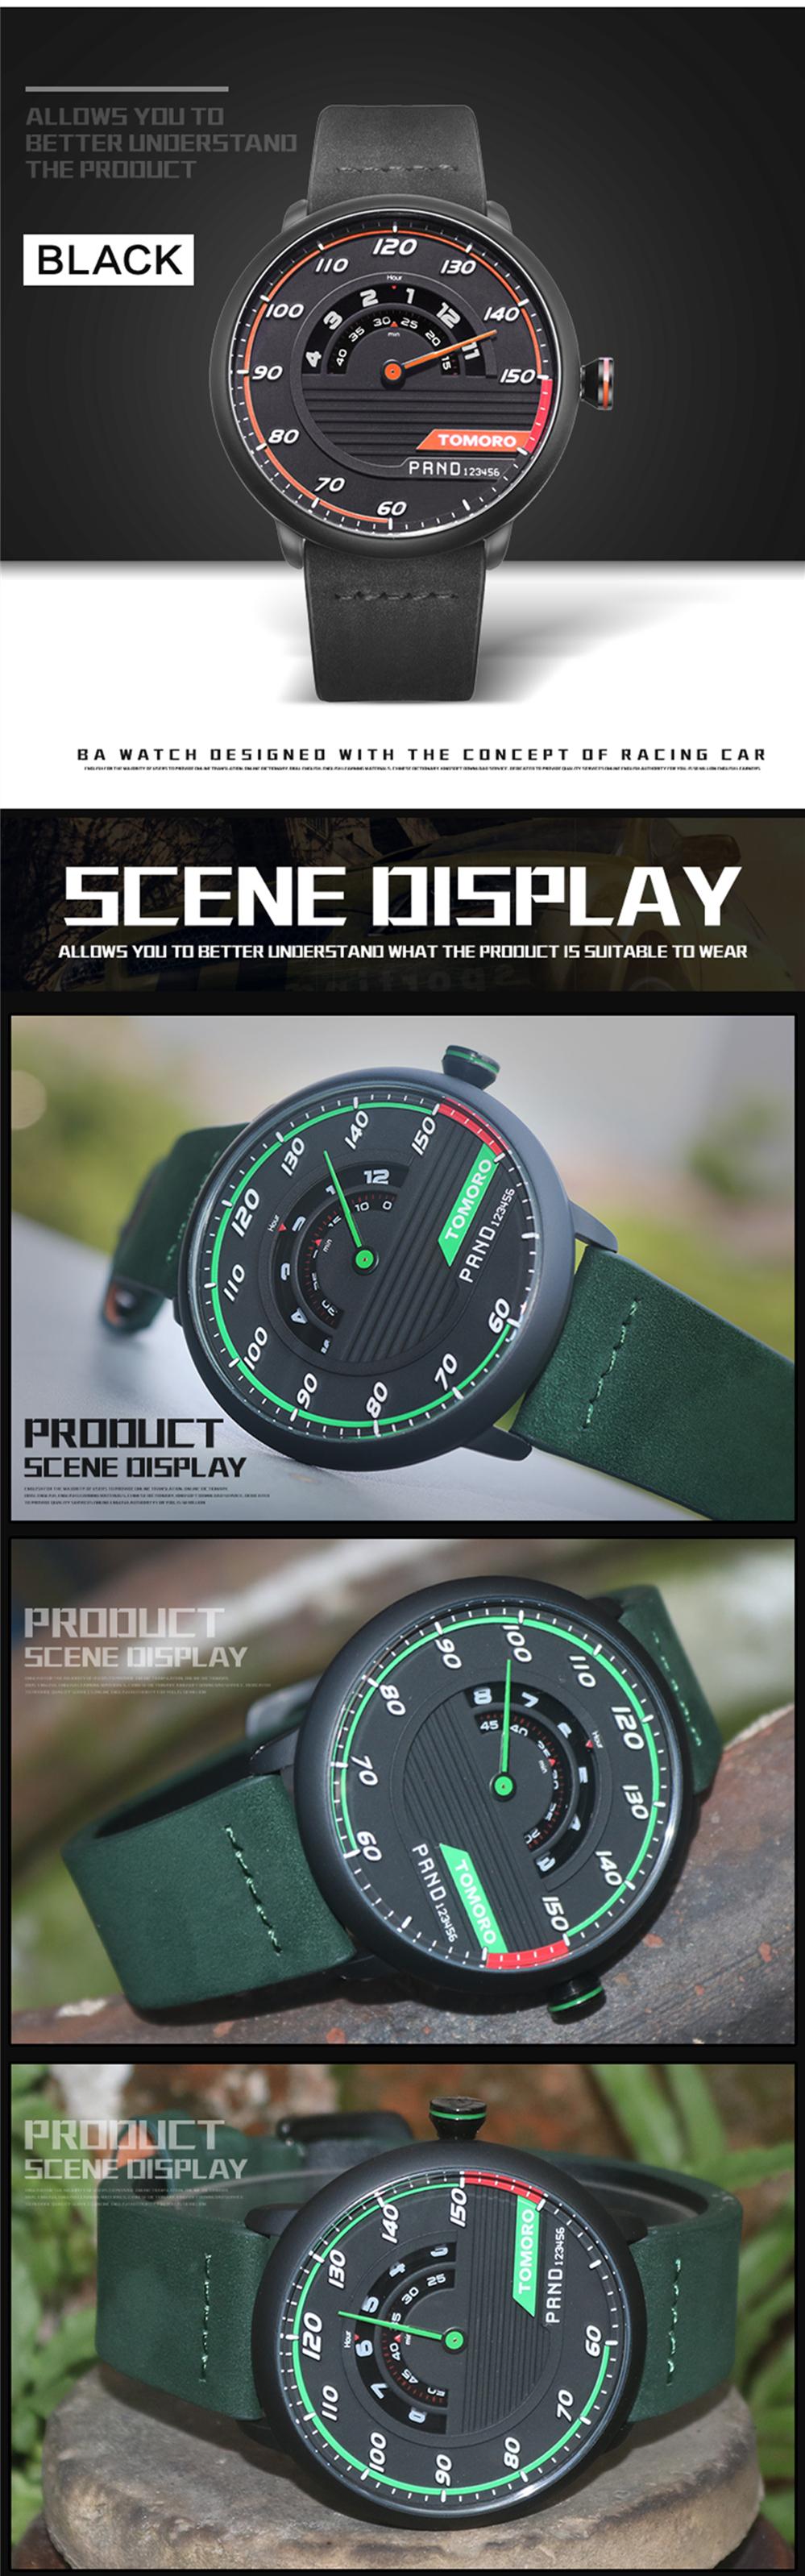 HTB1fDXbQVXXXXc9XFXXq6xXFXXXV TOMORO Men's Unique Racing Car 3D Design Wrist Watch